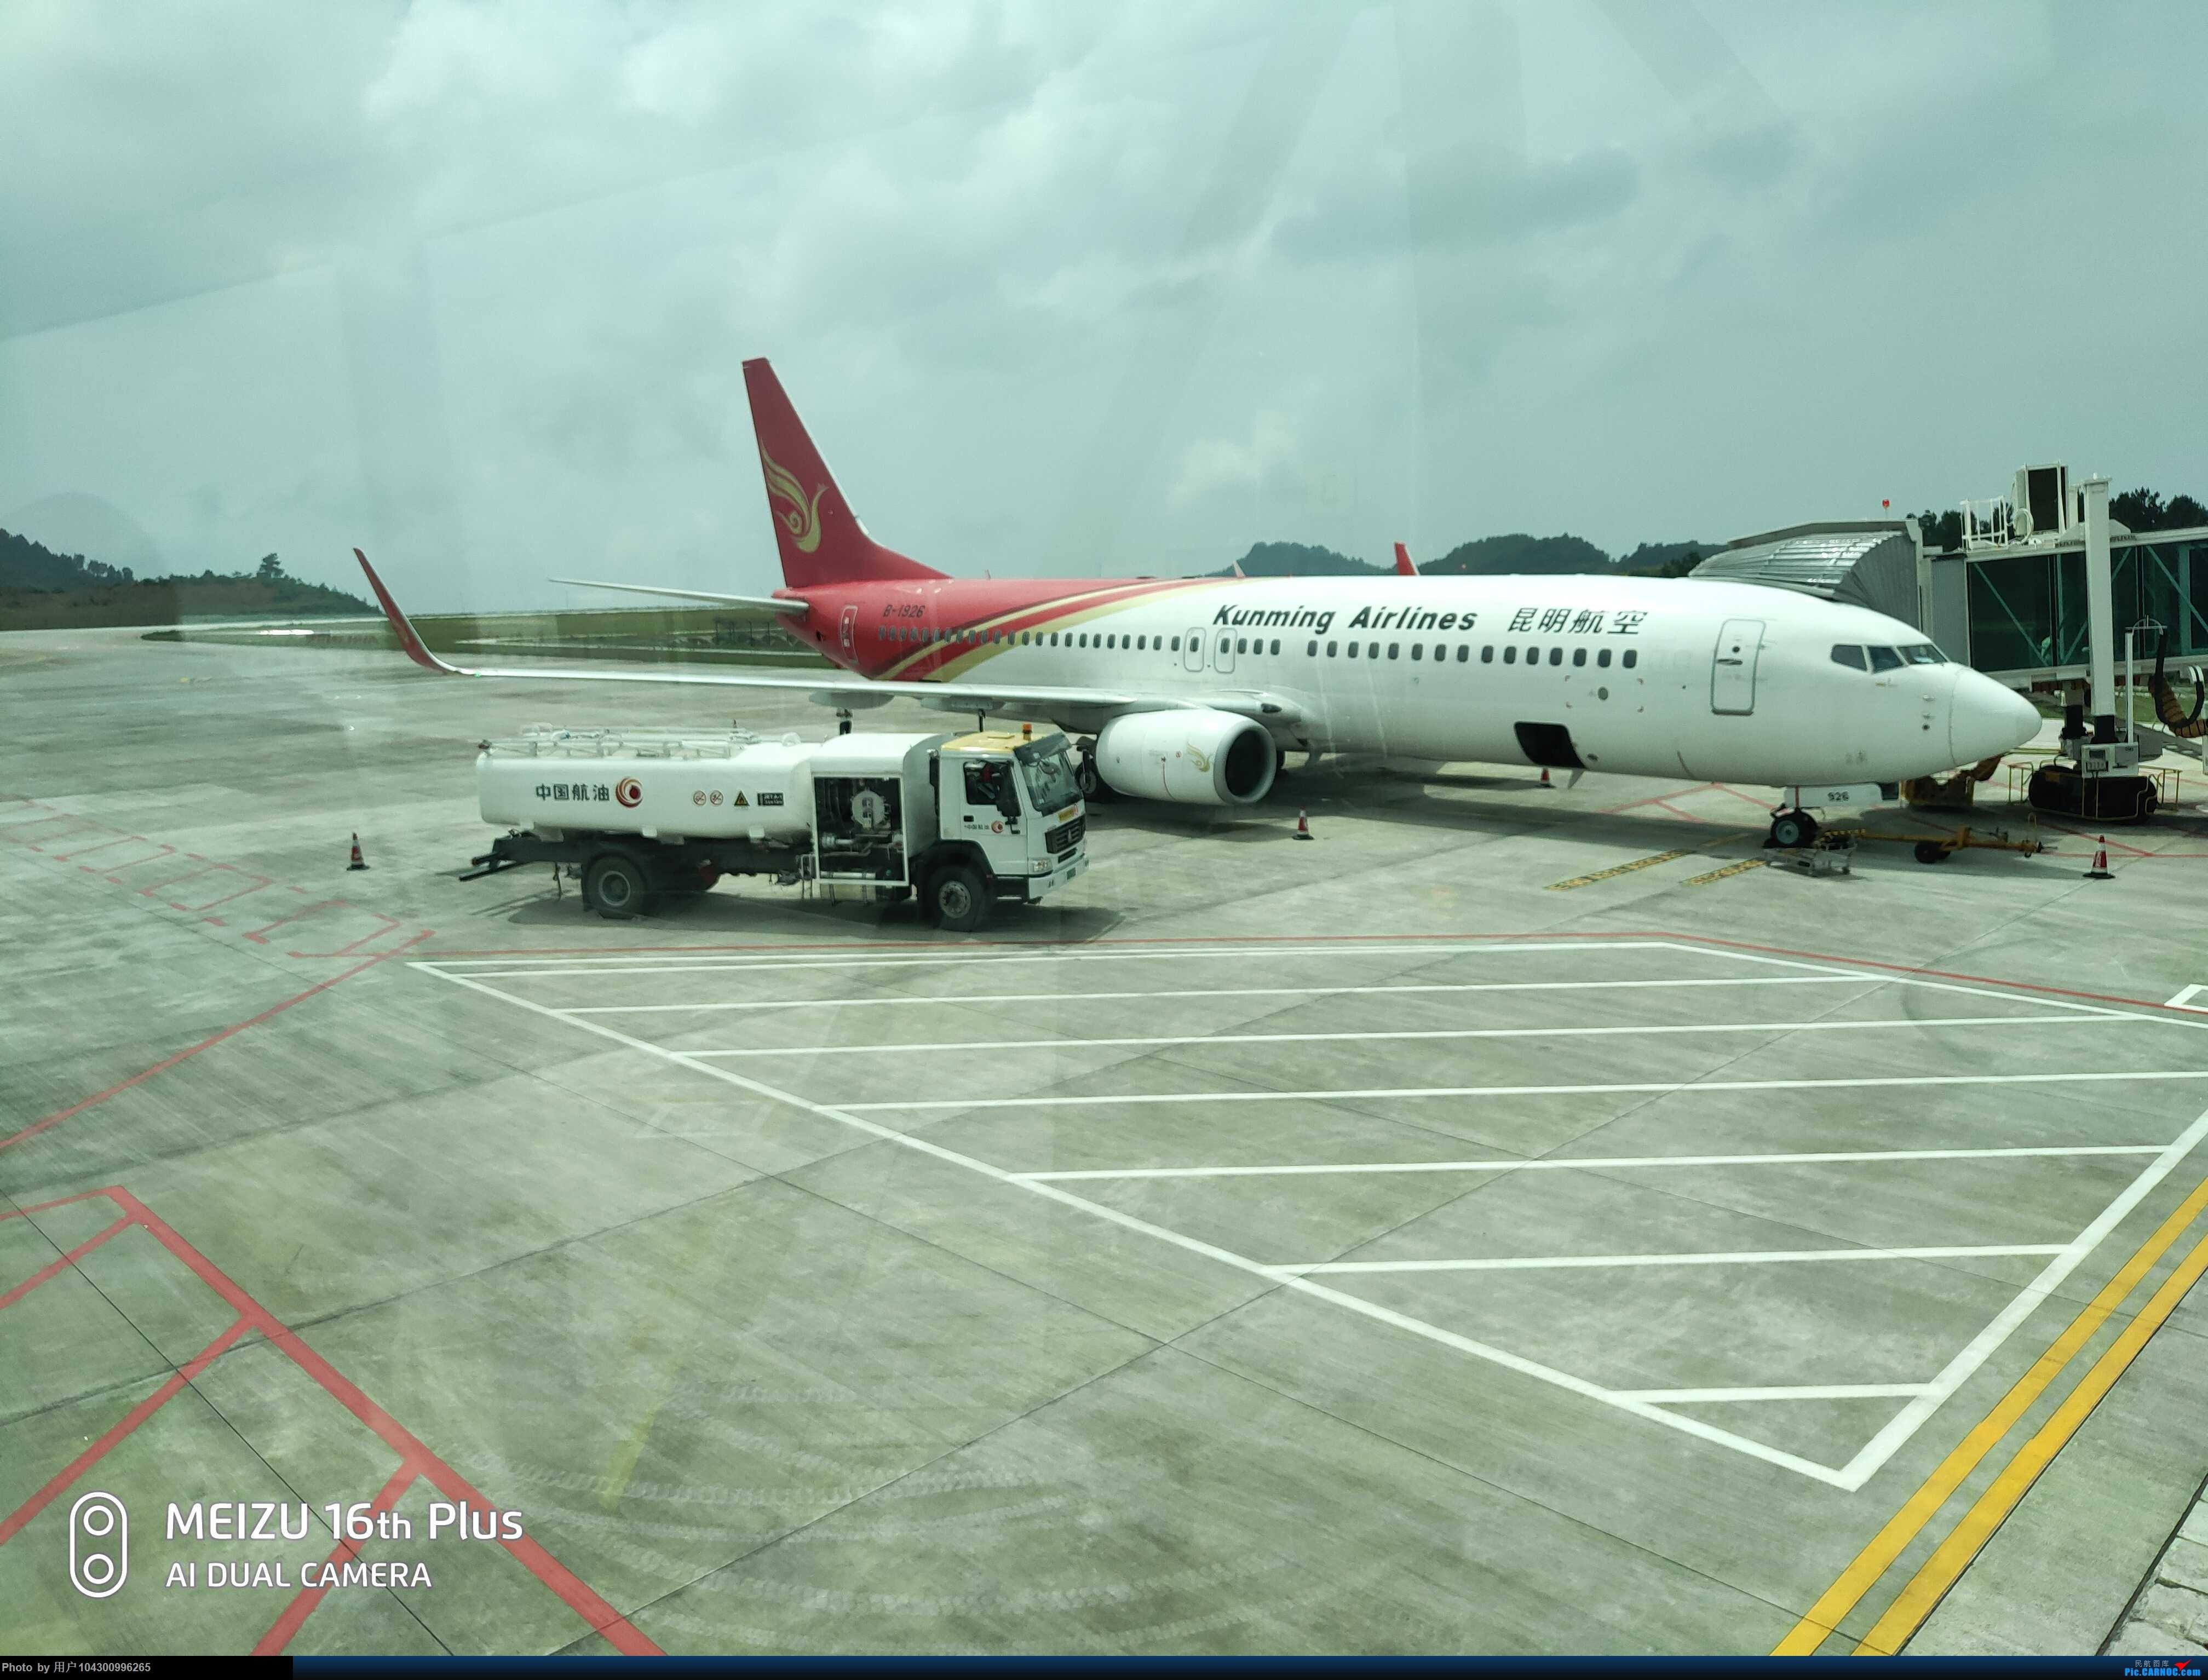 Re:[原创][DM哥飞行游记]-多彩贵州航空贵阳-茅台当日往返 BOEING 737-800 B-1926 中国遵义茅台机场